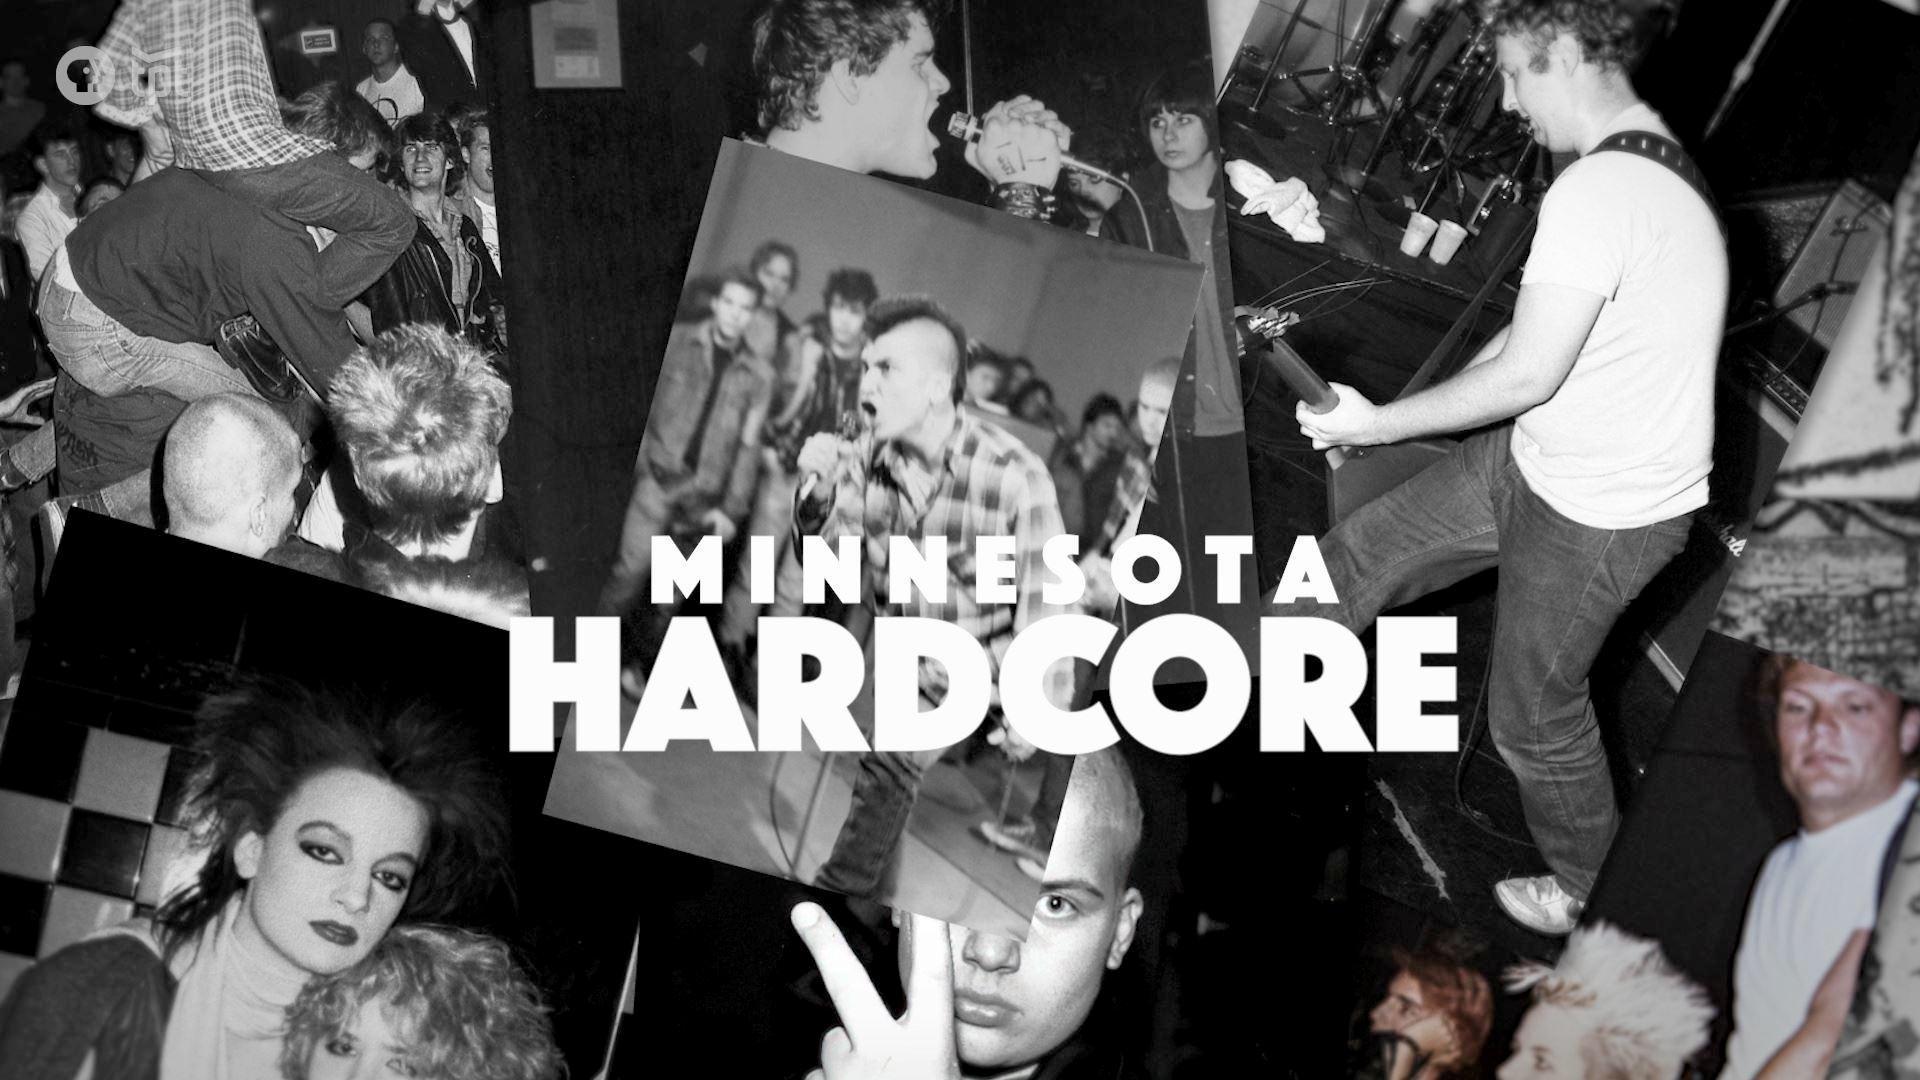 Minnesota Hardcore - MN Hardcore: 1. Backstory - Twin Cities PBS